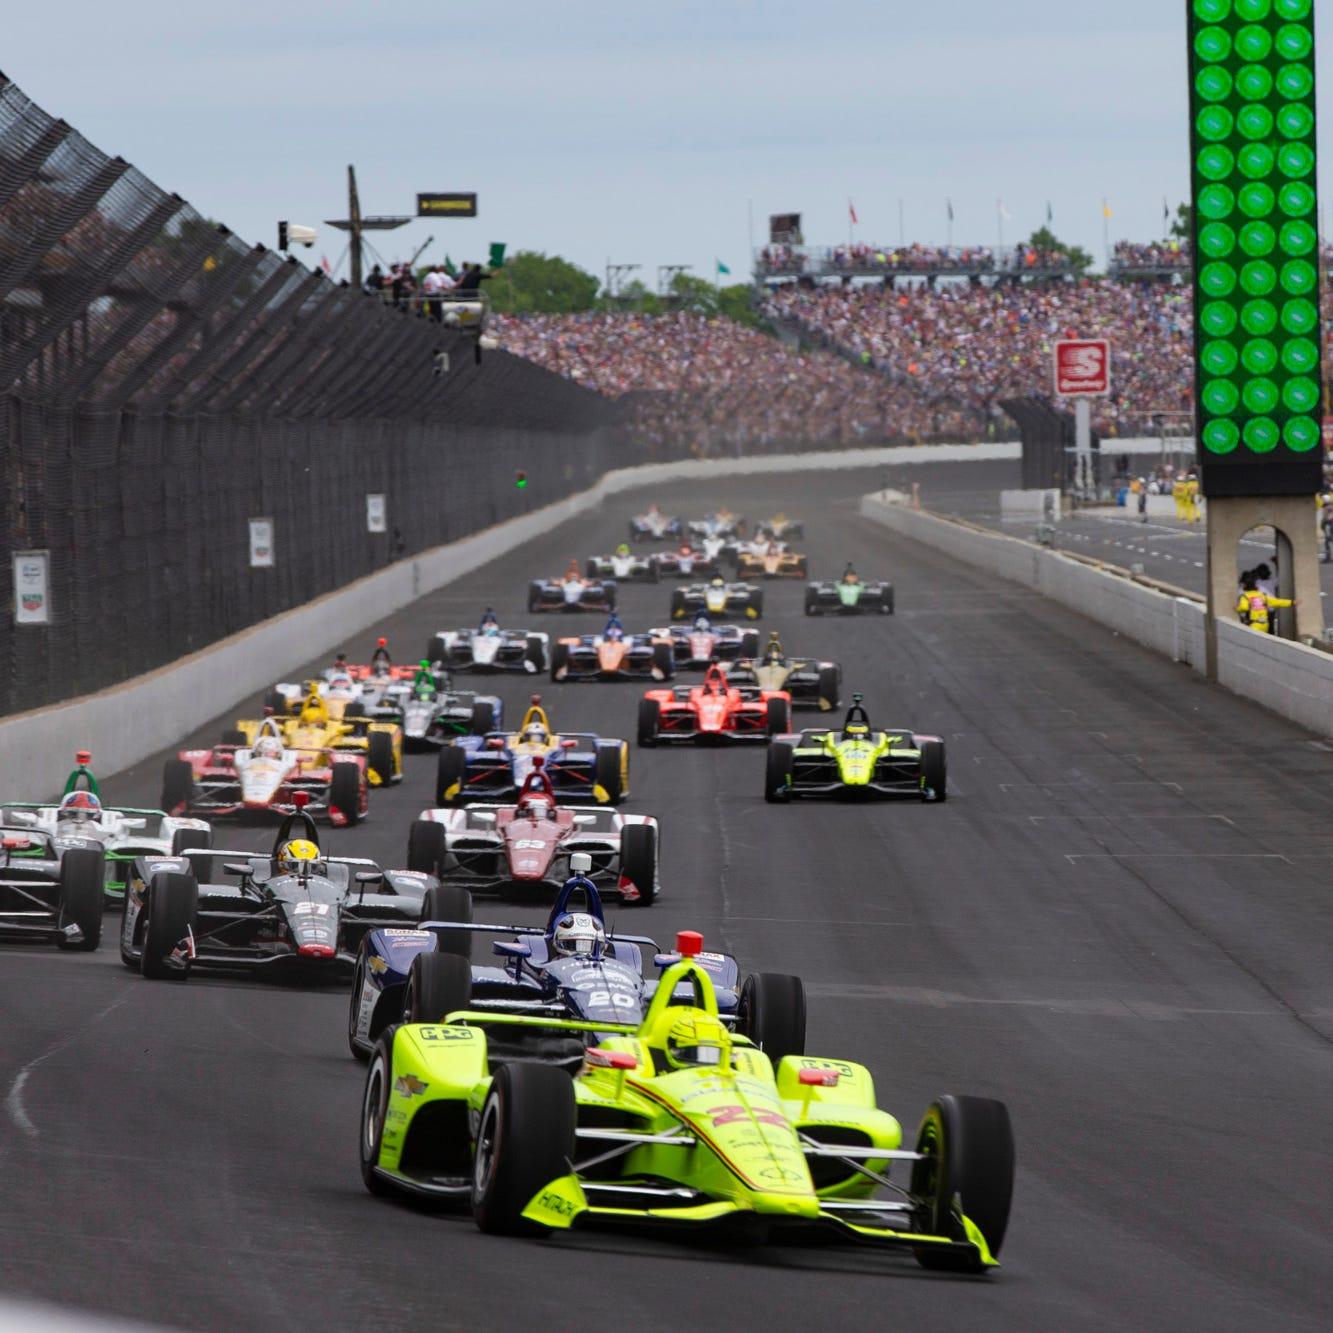 Indy 500 live blog updates: Last round of pit stops set up finish